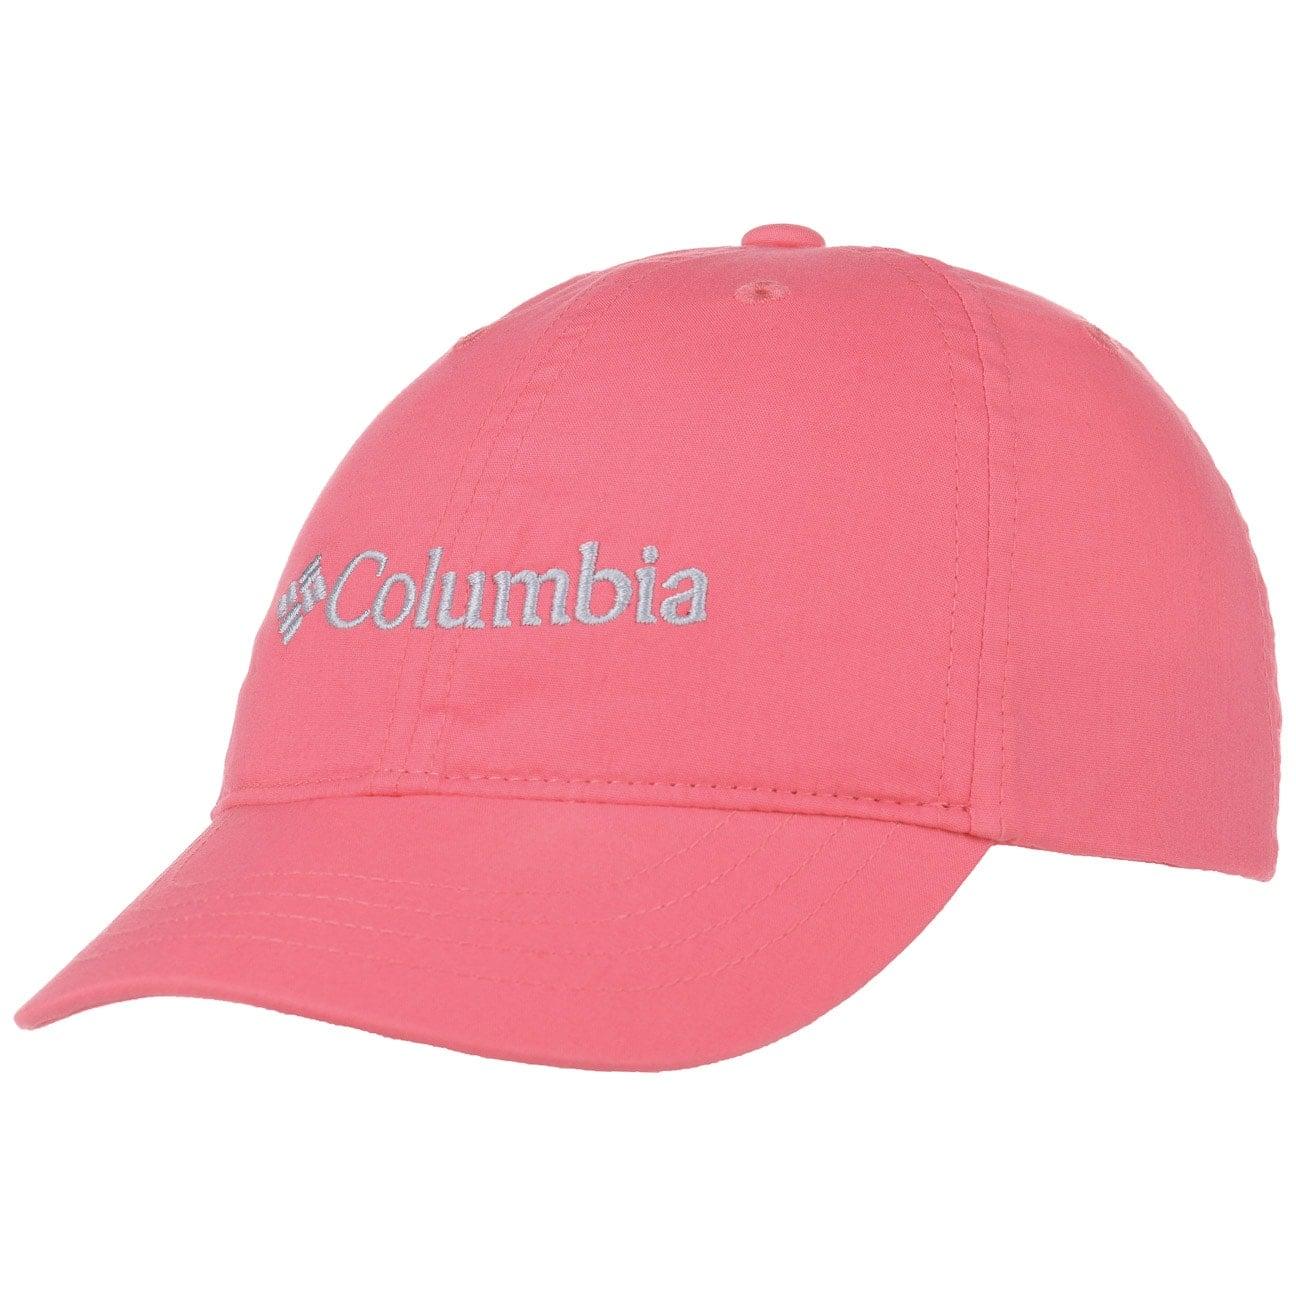 Gorra de B?isbol Youth by Columbia  gorra de b?isbol